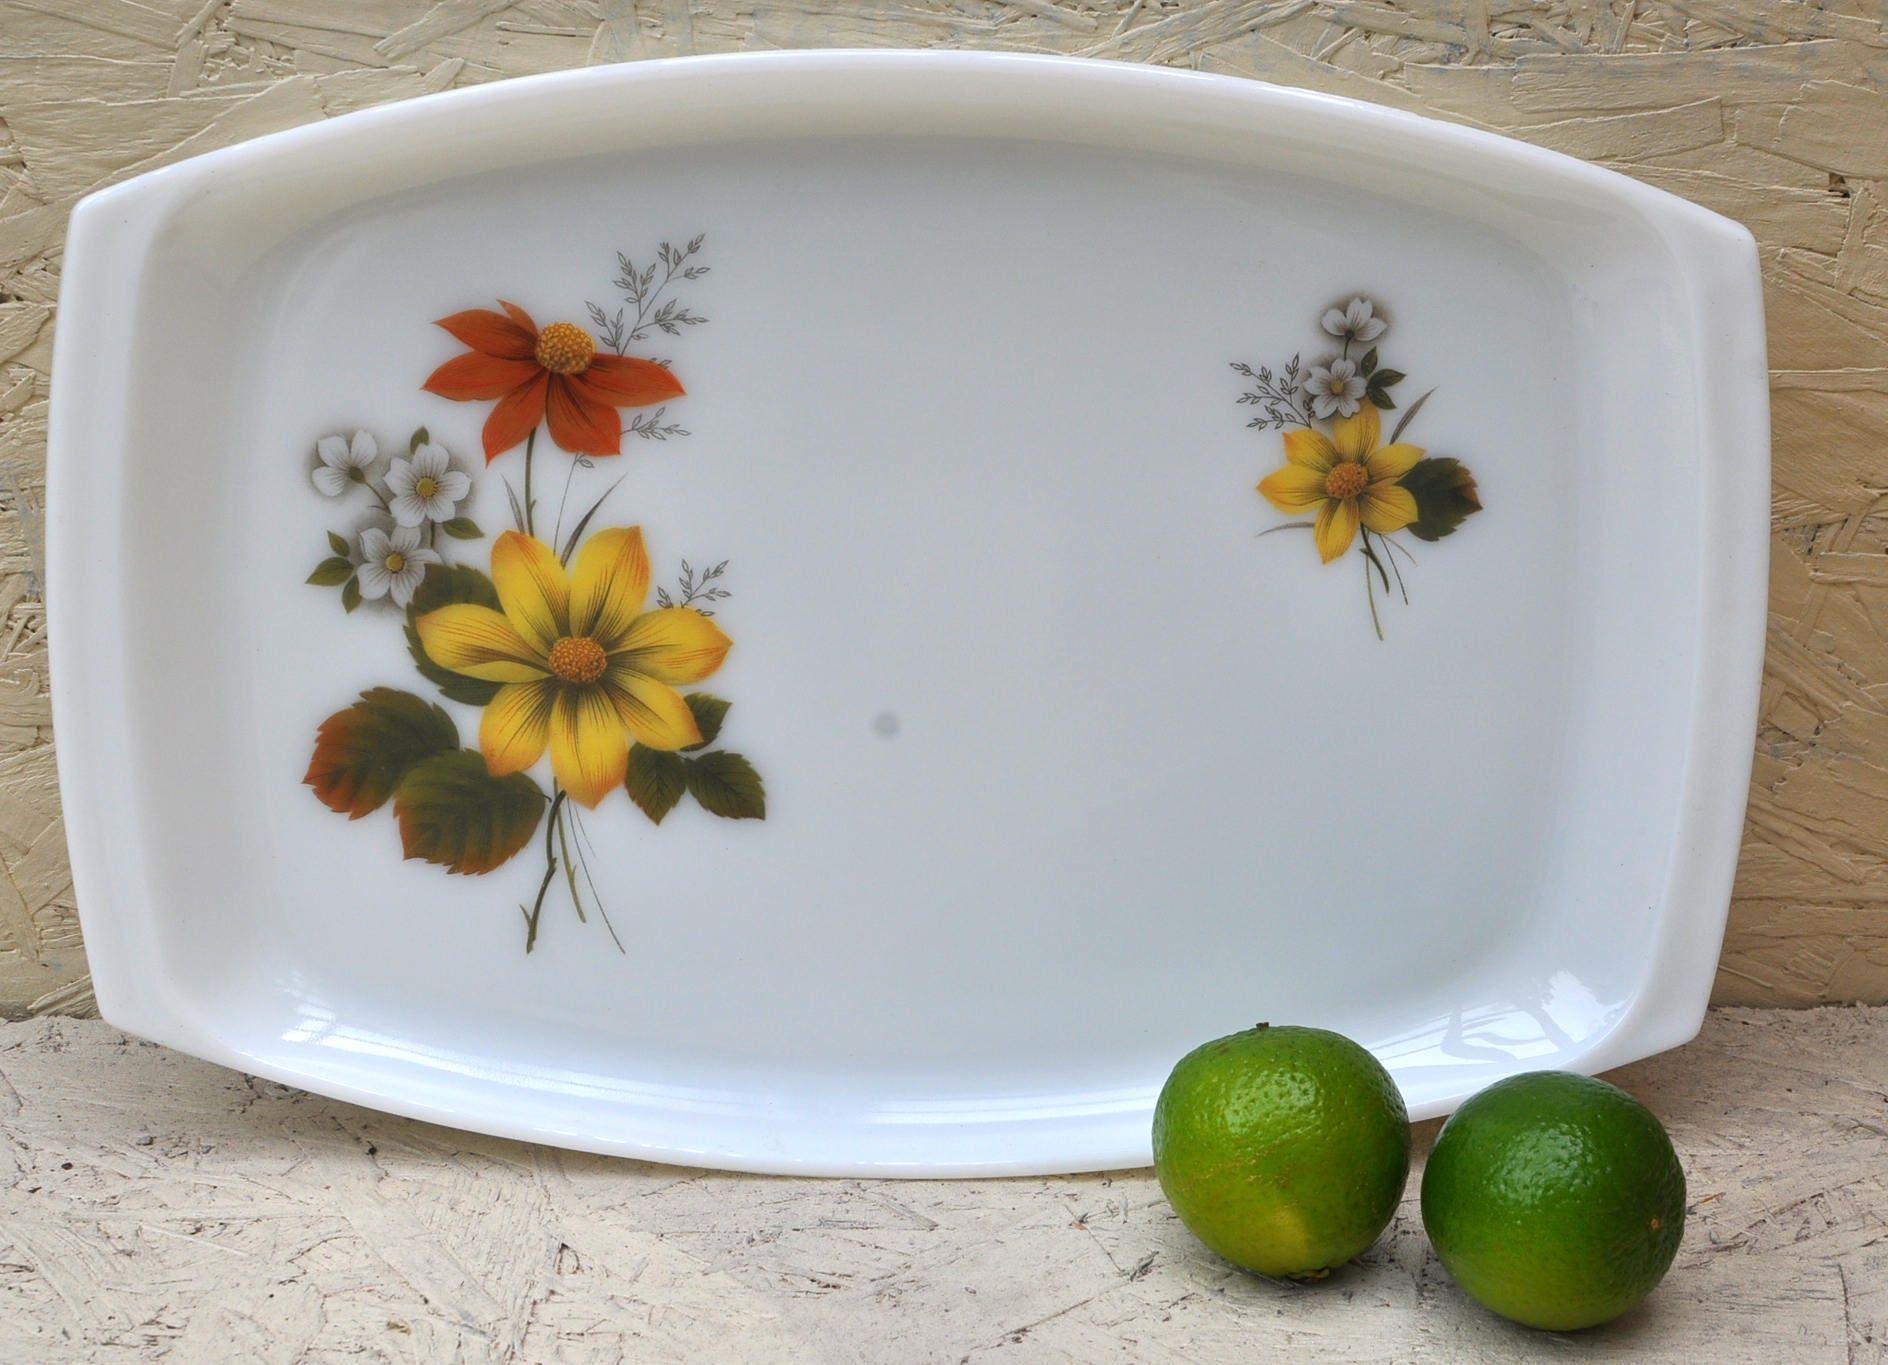 Original 1960s Vintage Pyrex Serving Platter Tray with Retro Floral Pattern